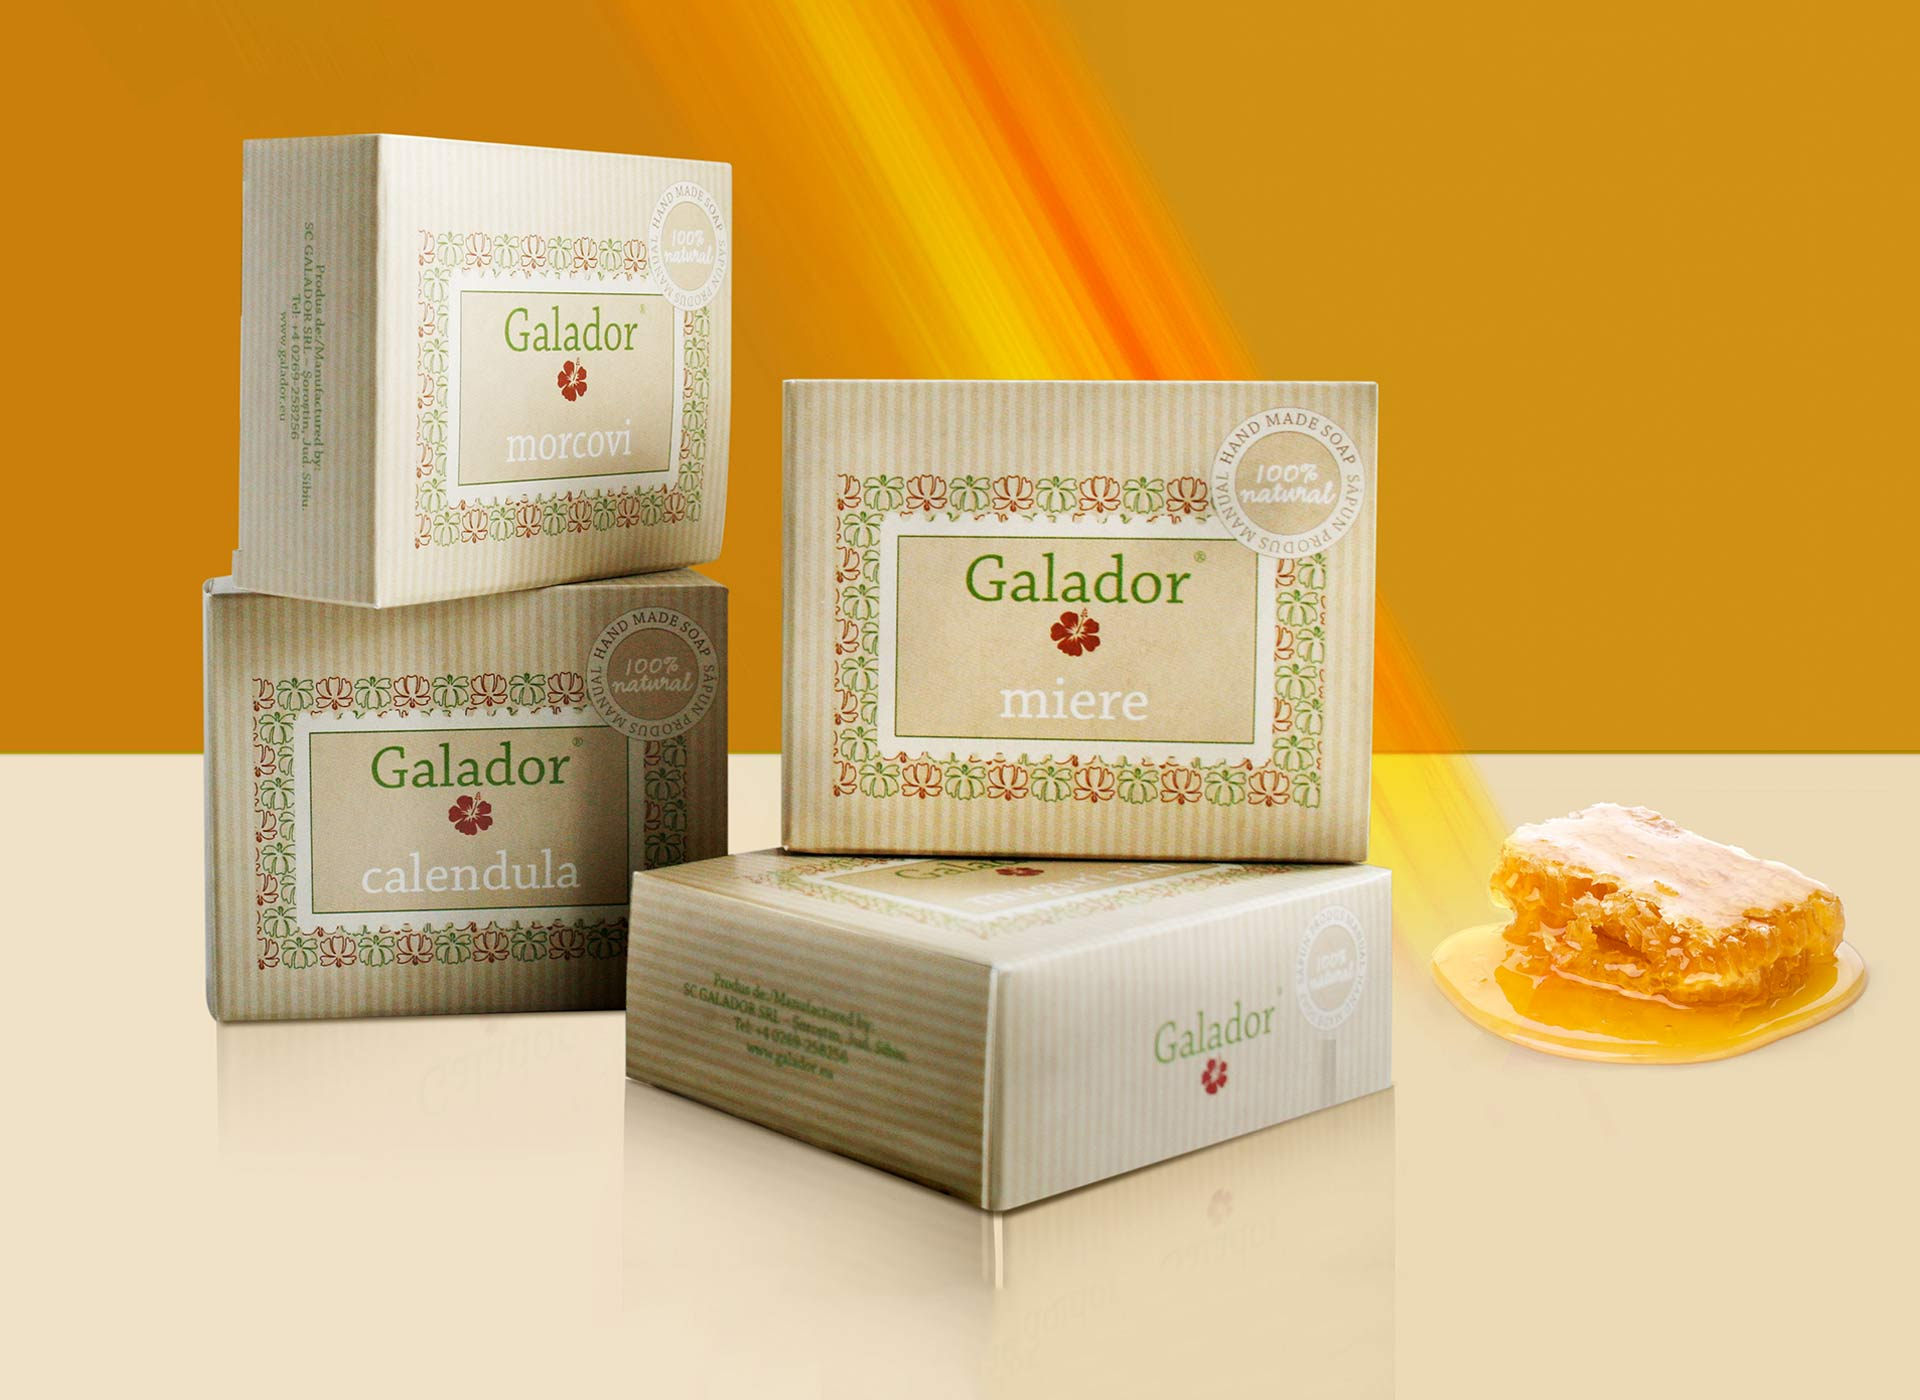 galador package design brand